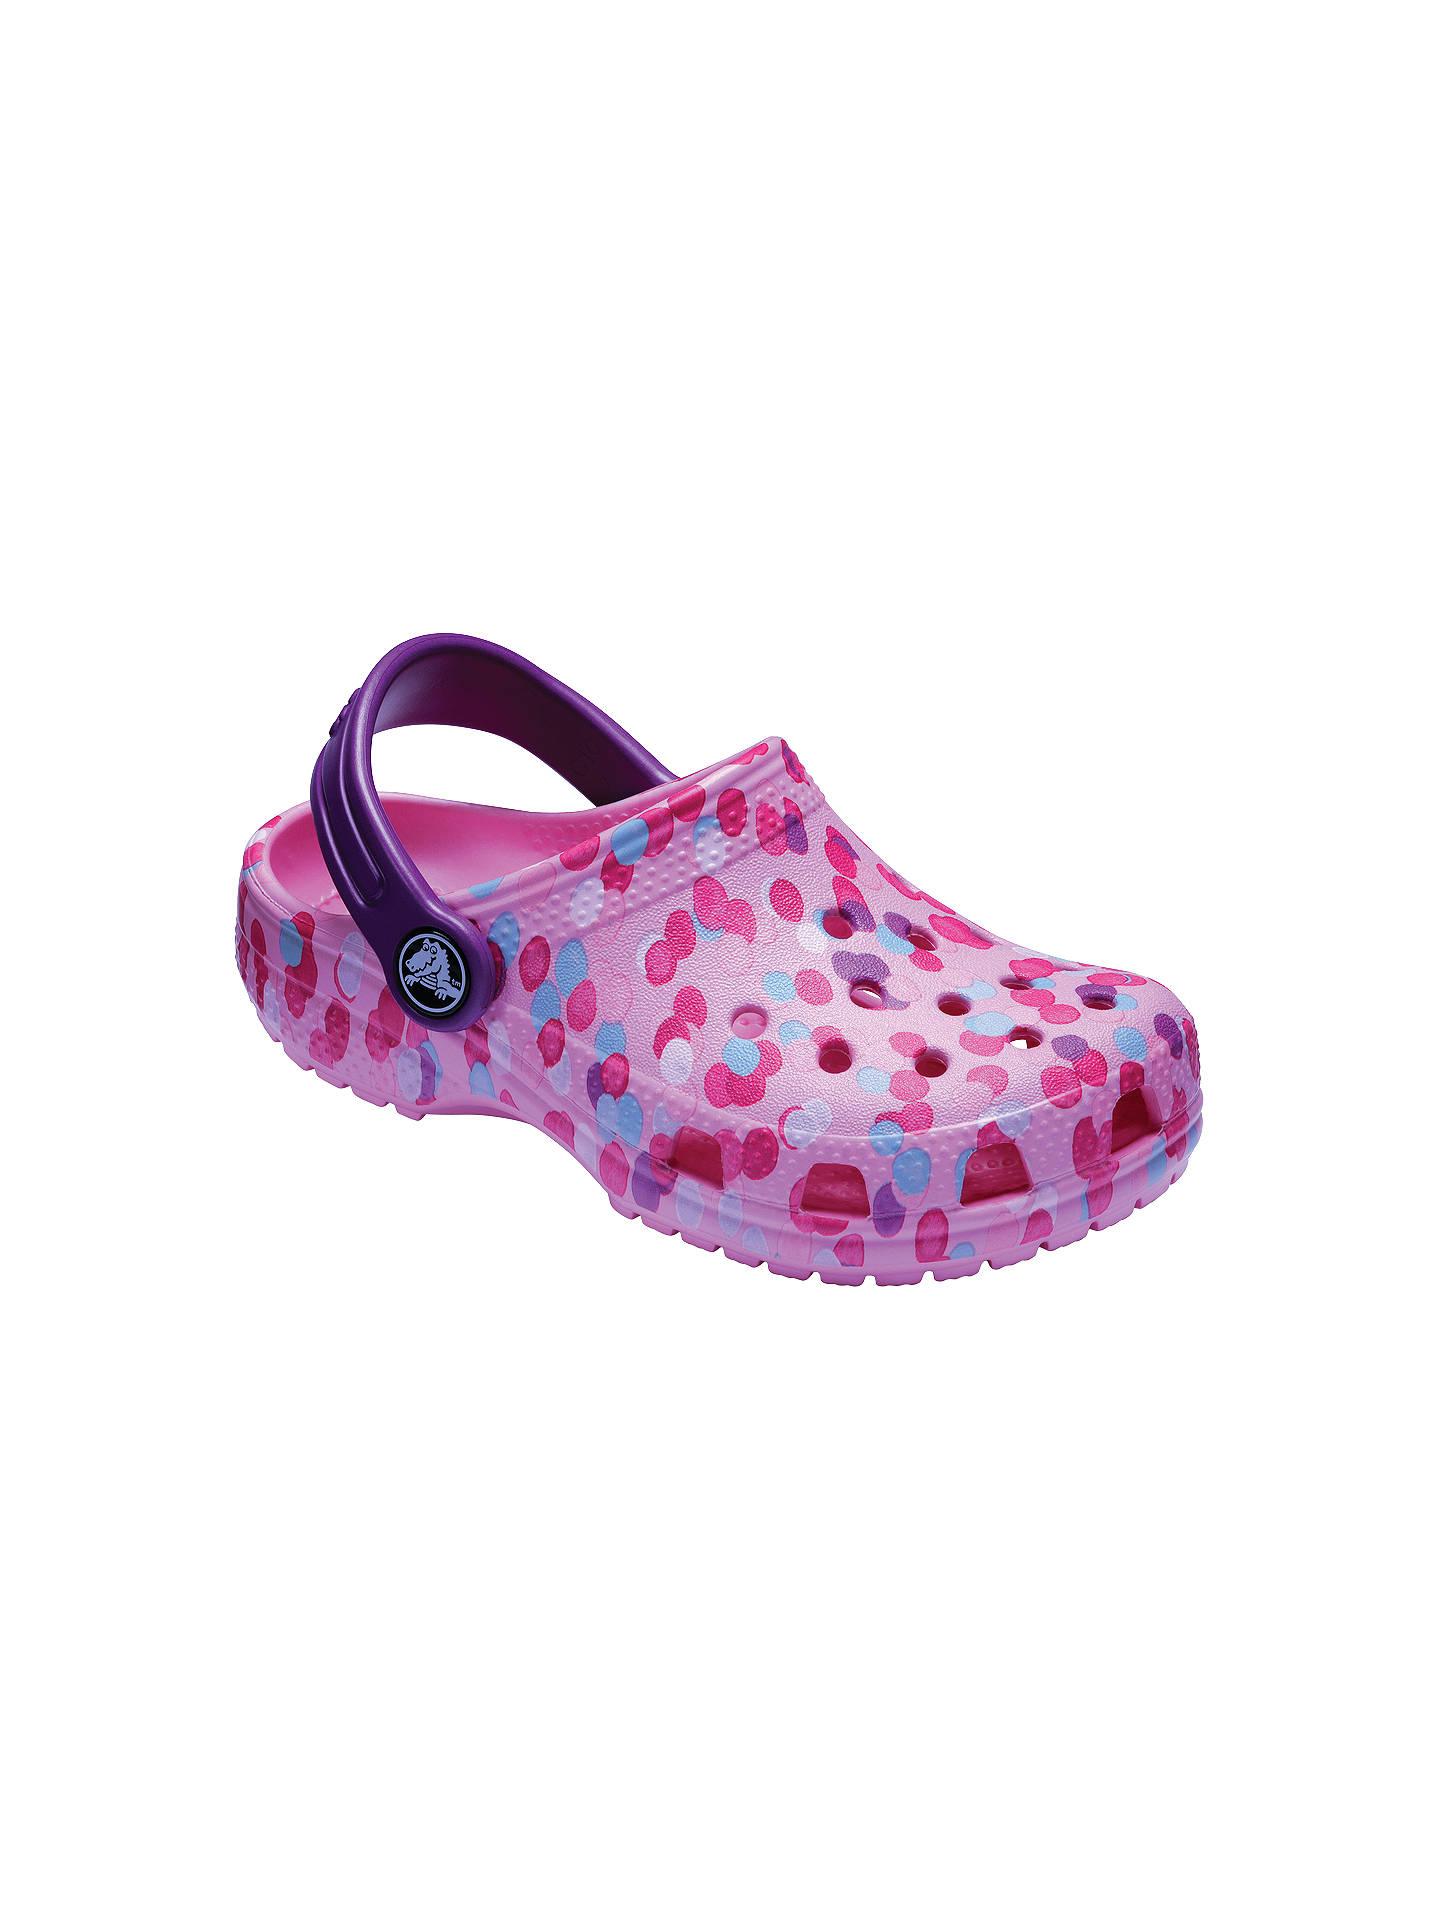 293f11a54 Buy Crocs Children s Classic Croc Graphic Clogs